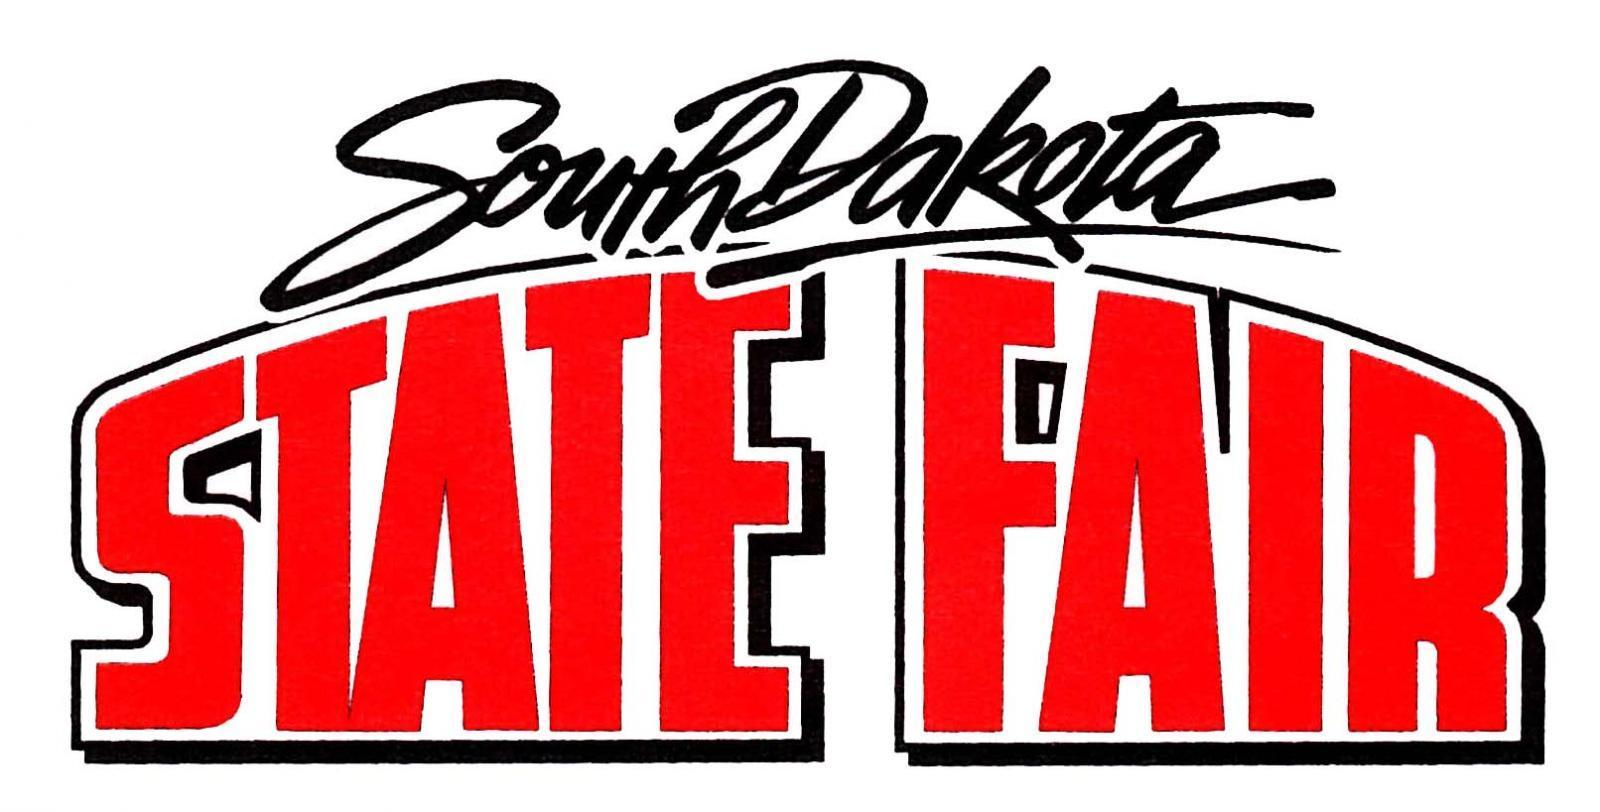 SD State Fair image